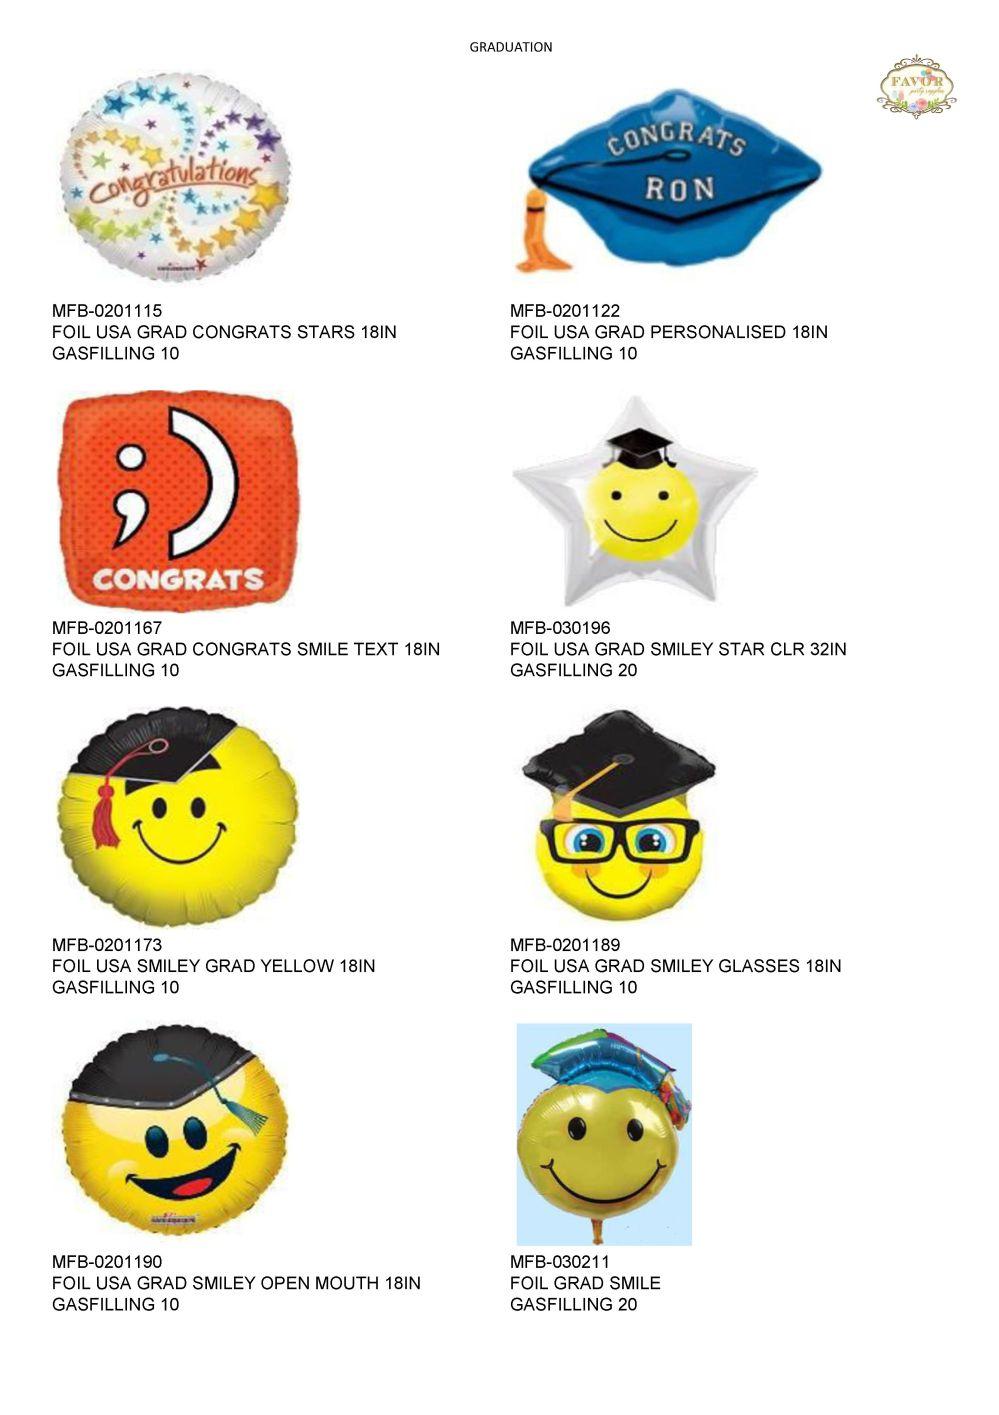 katalog-graduation_1